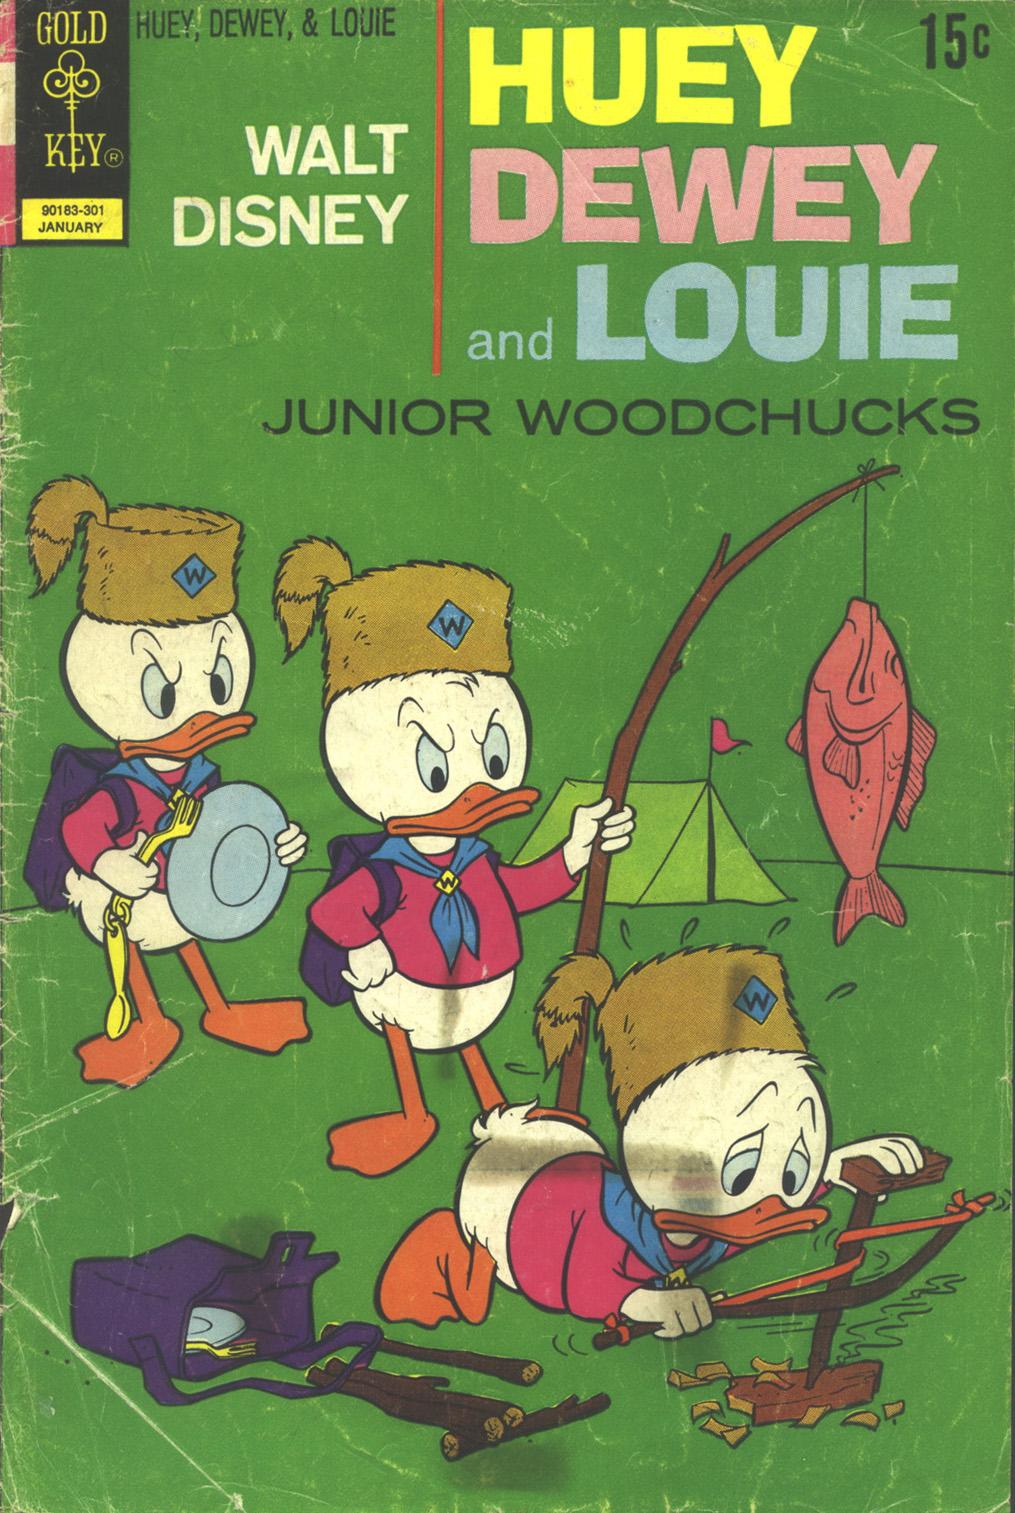 Huey, Dewey, and Louie Junior Woodchucks 18 Page 1